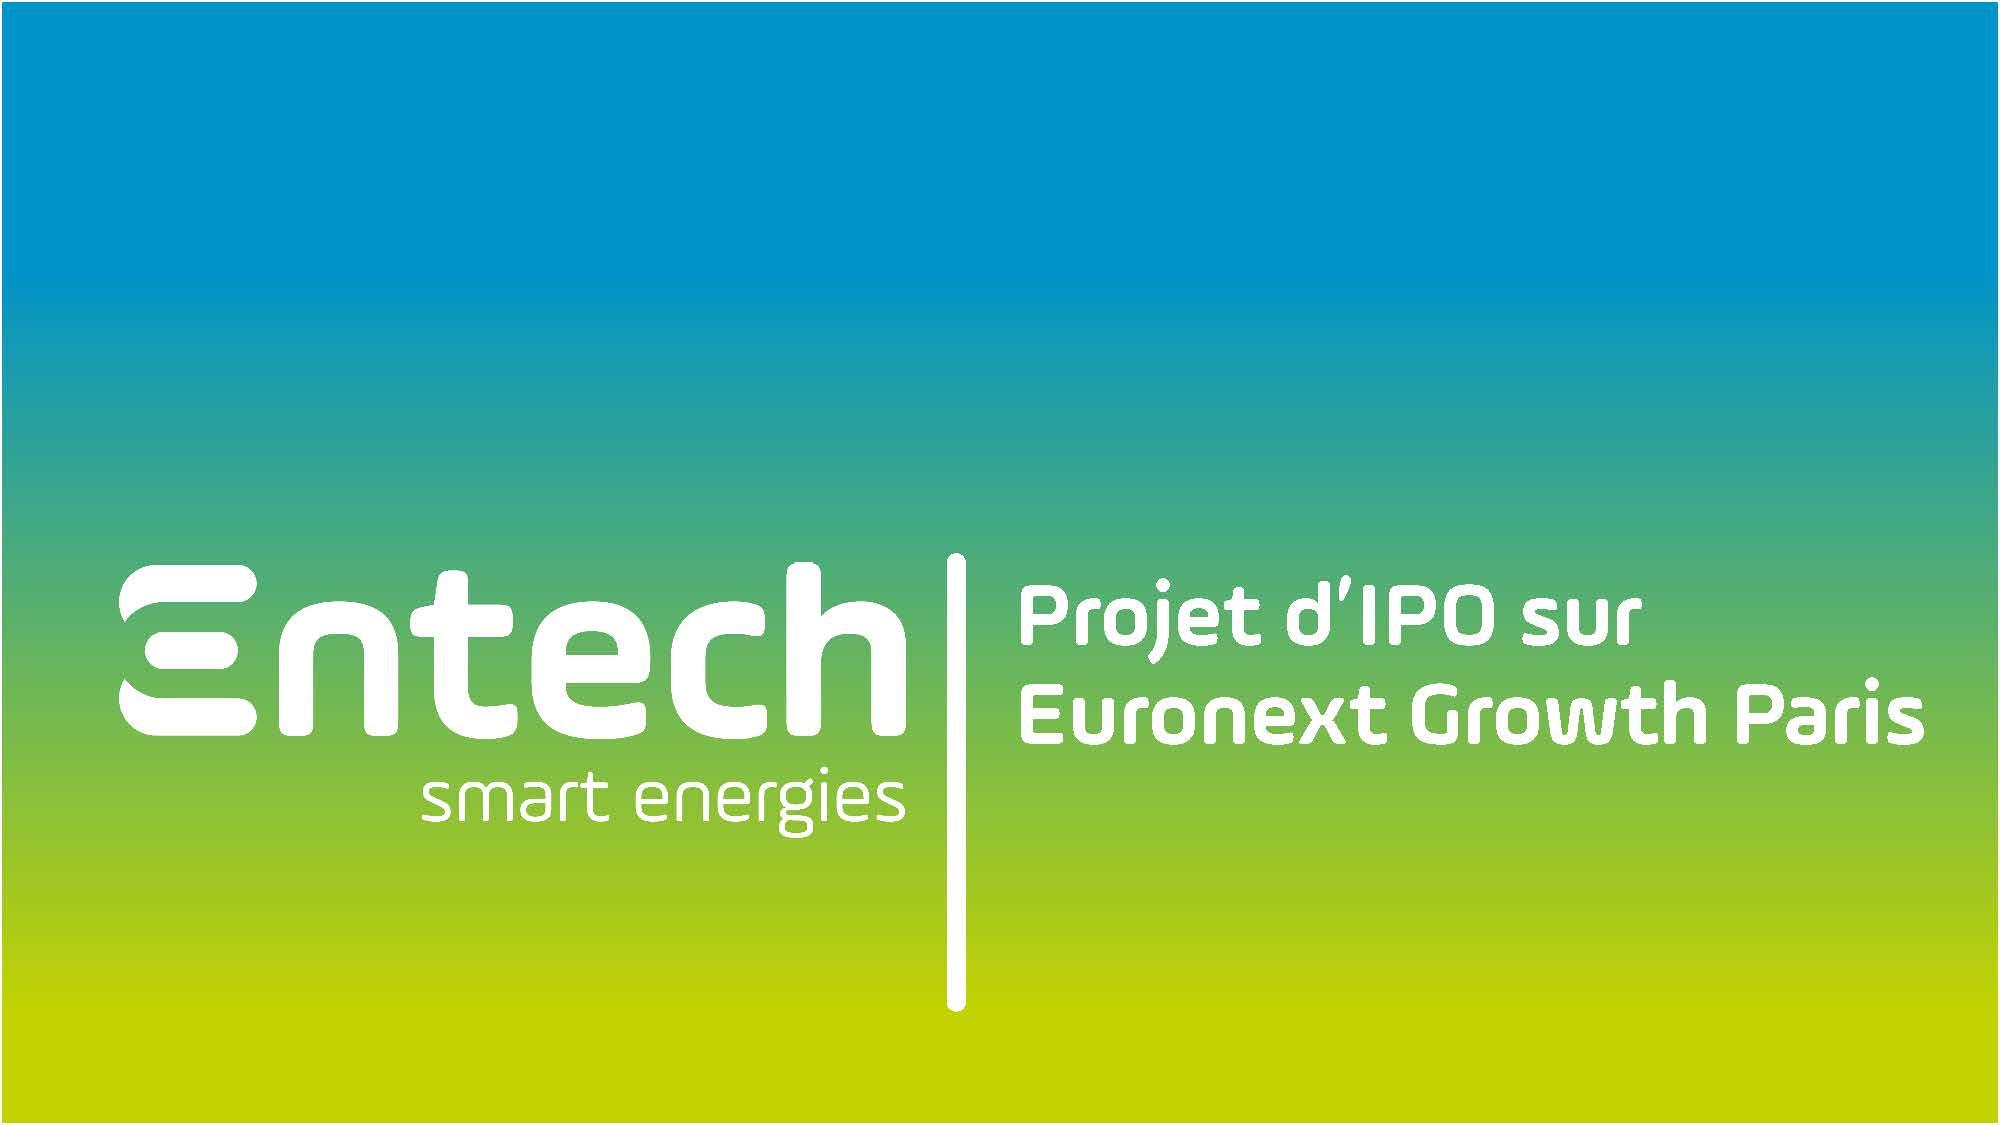 ENTECH_PRES_IPO_210914_FR_Page_44